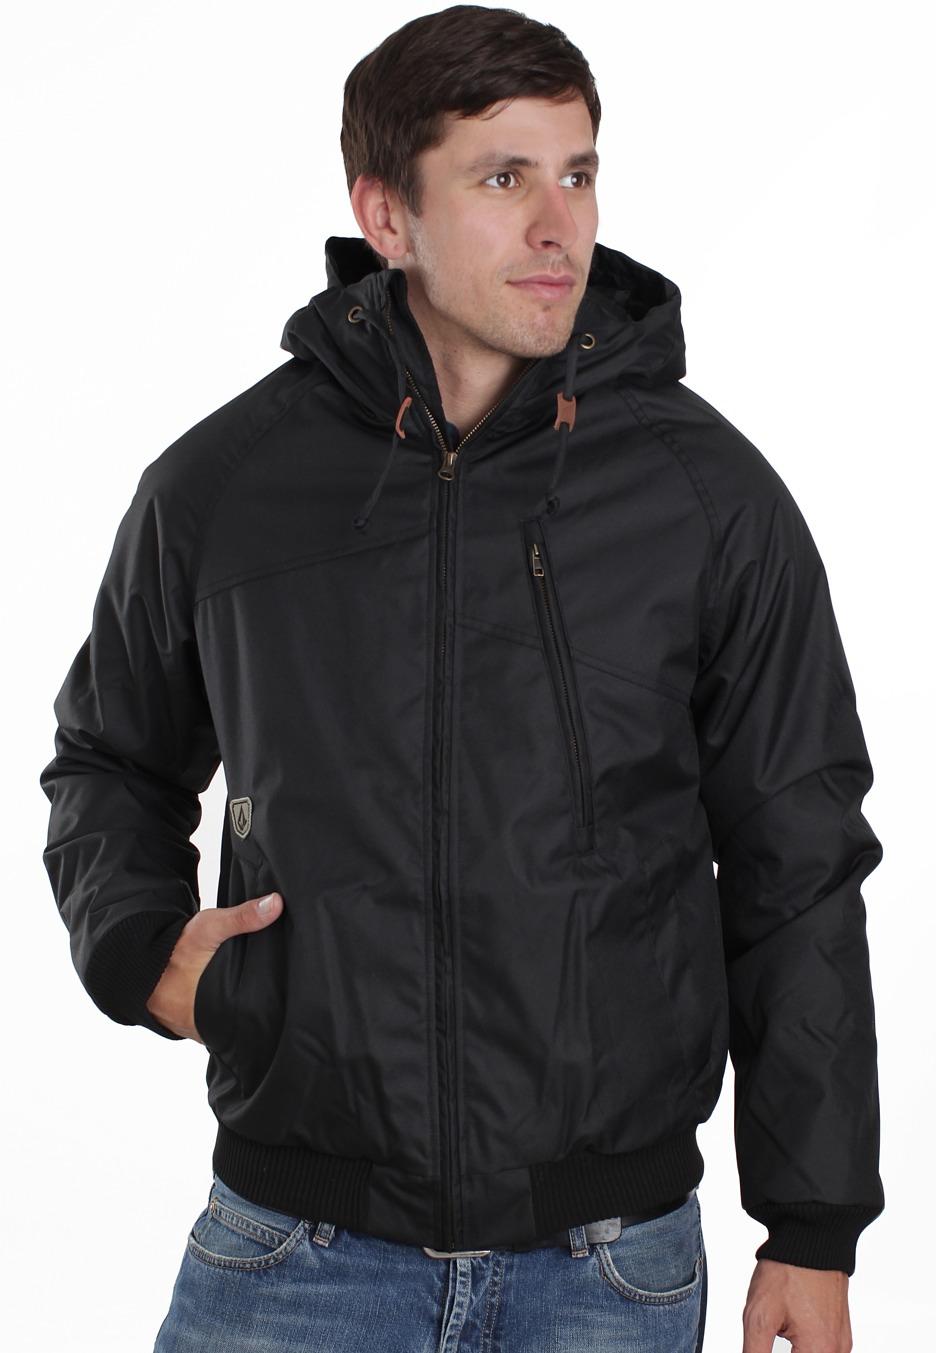 310fa2c22347 Volcom - Hernan - Jacket - Streetwear Shop - Impericon.com UK